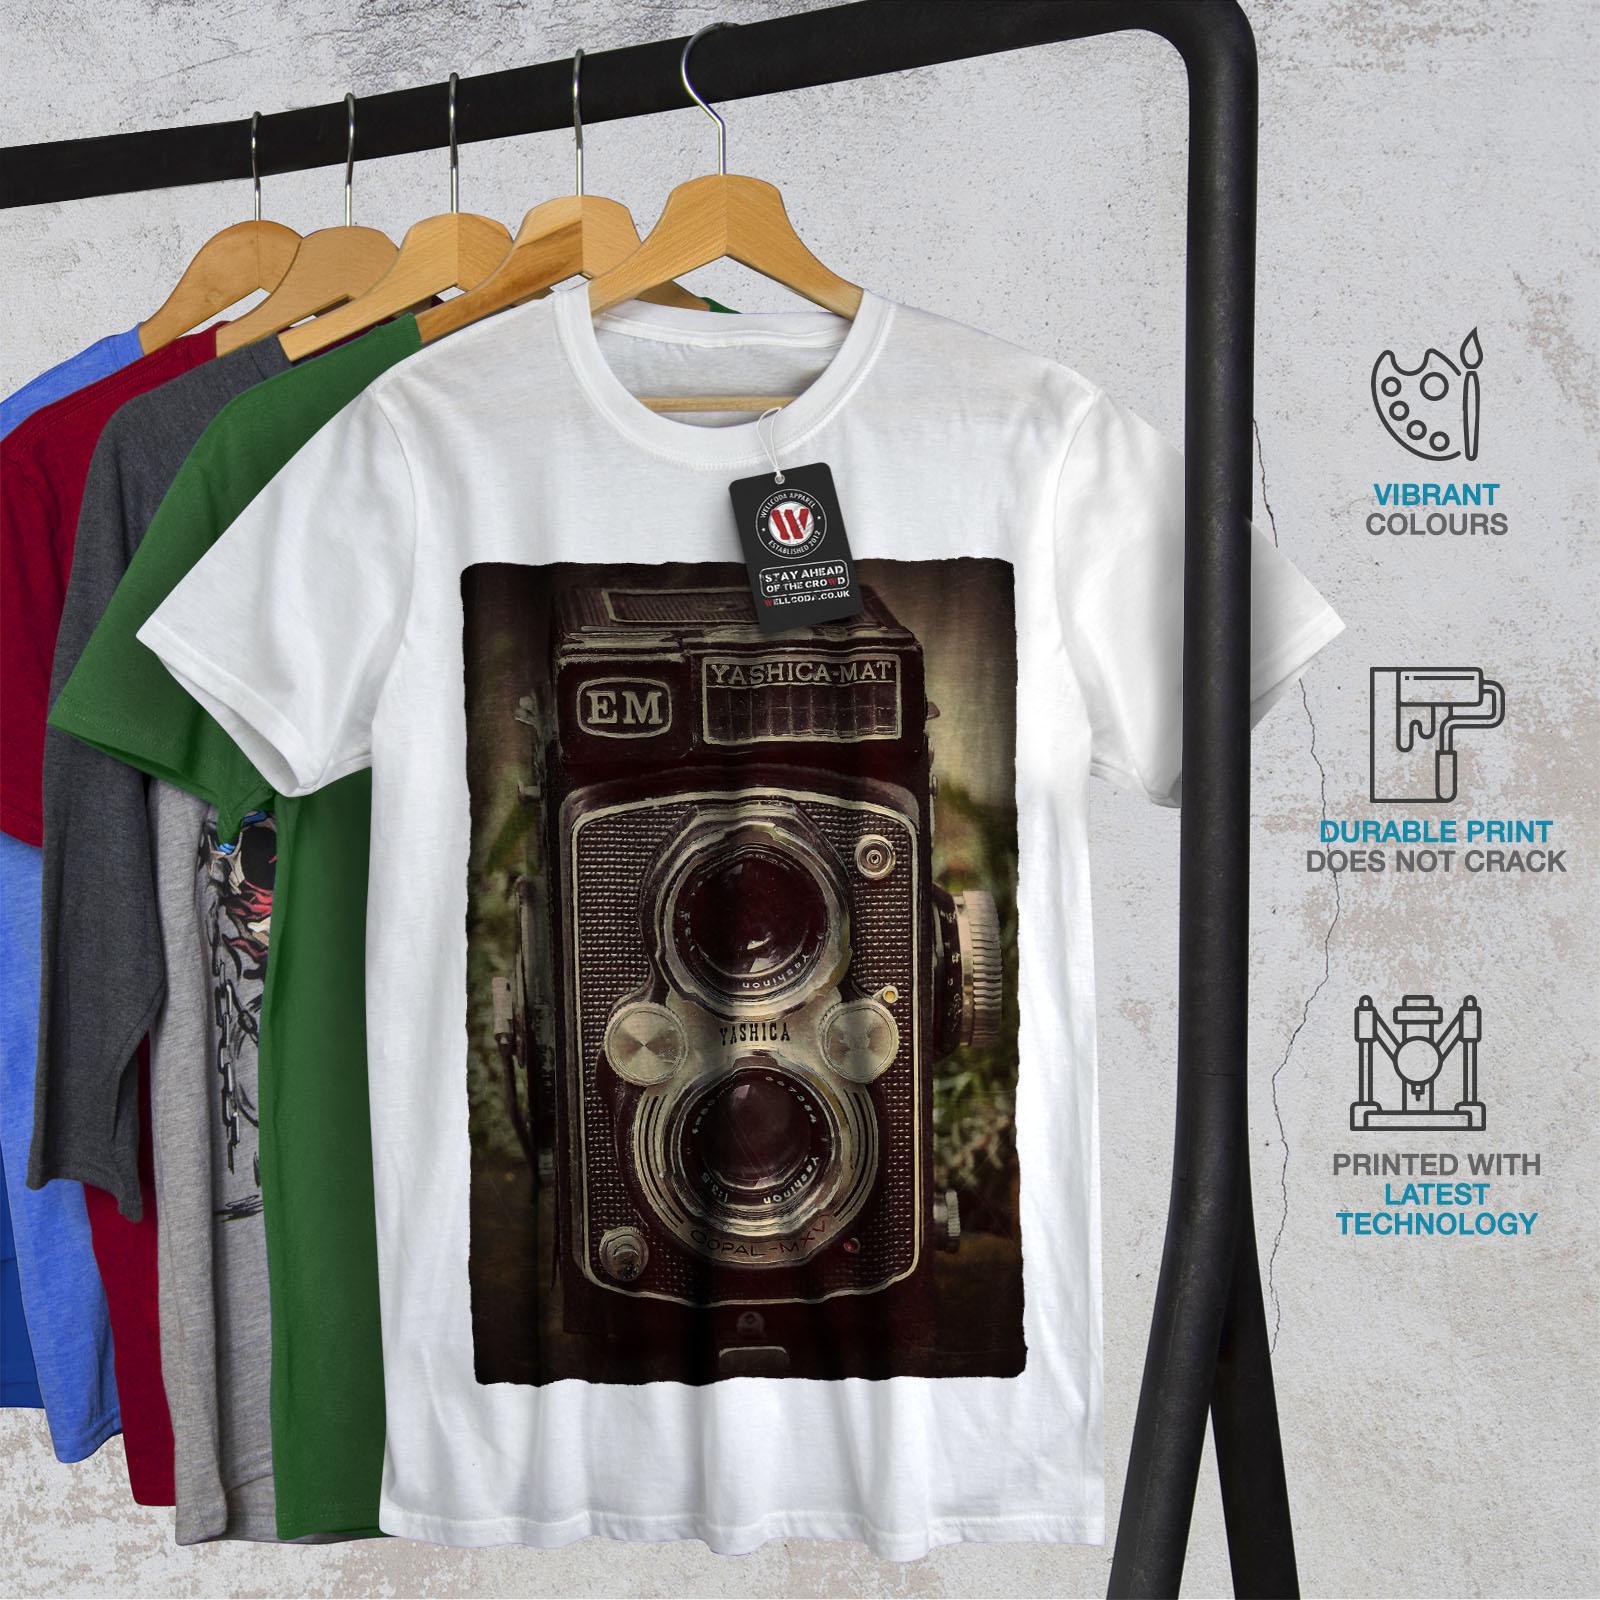 Wellcoda-Old-Foto-Camera-Mens-T-shirt-Retro-Graphic-Design-Printed-Tee thumbnail 12